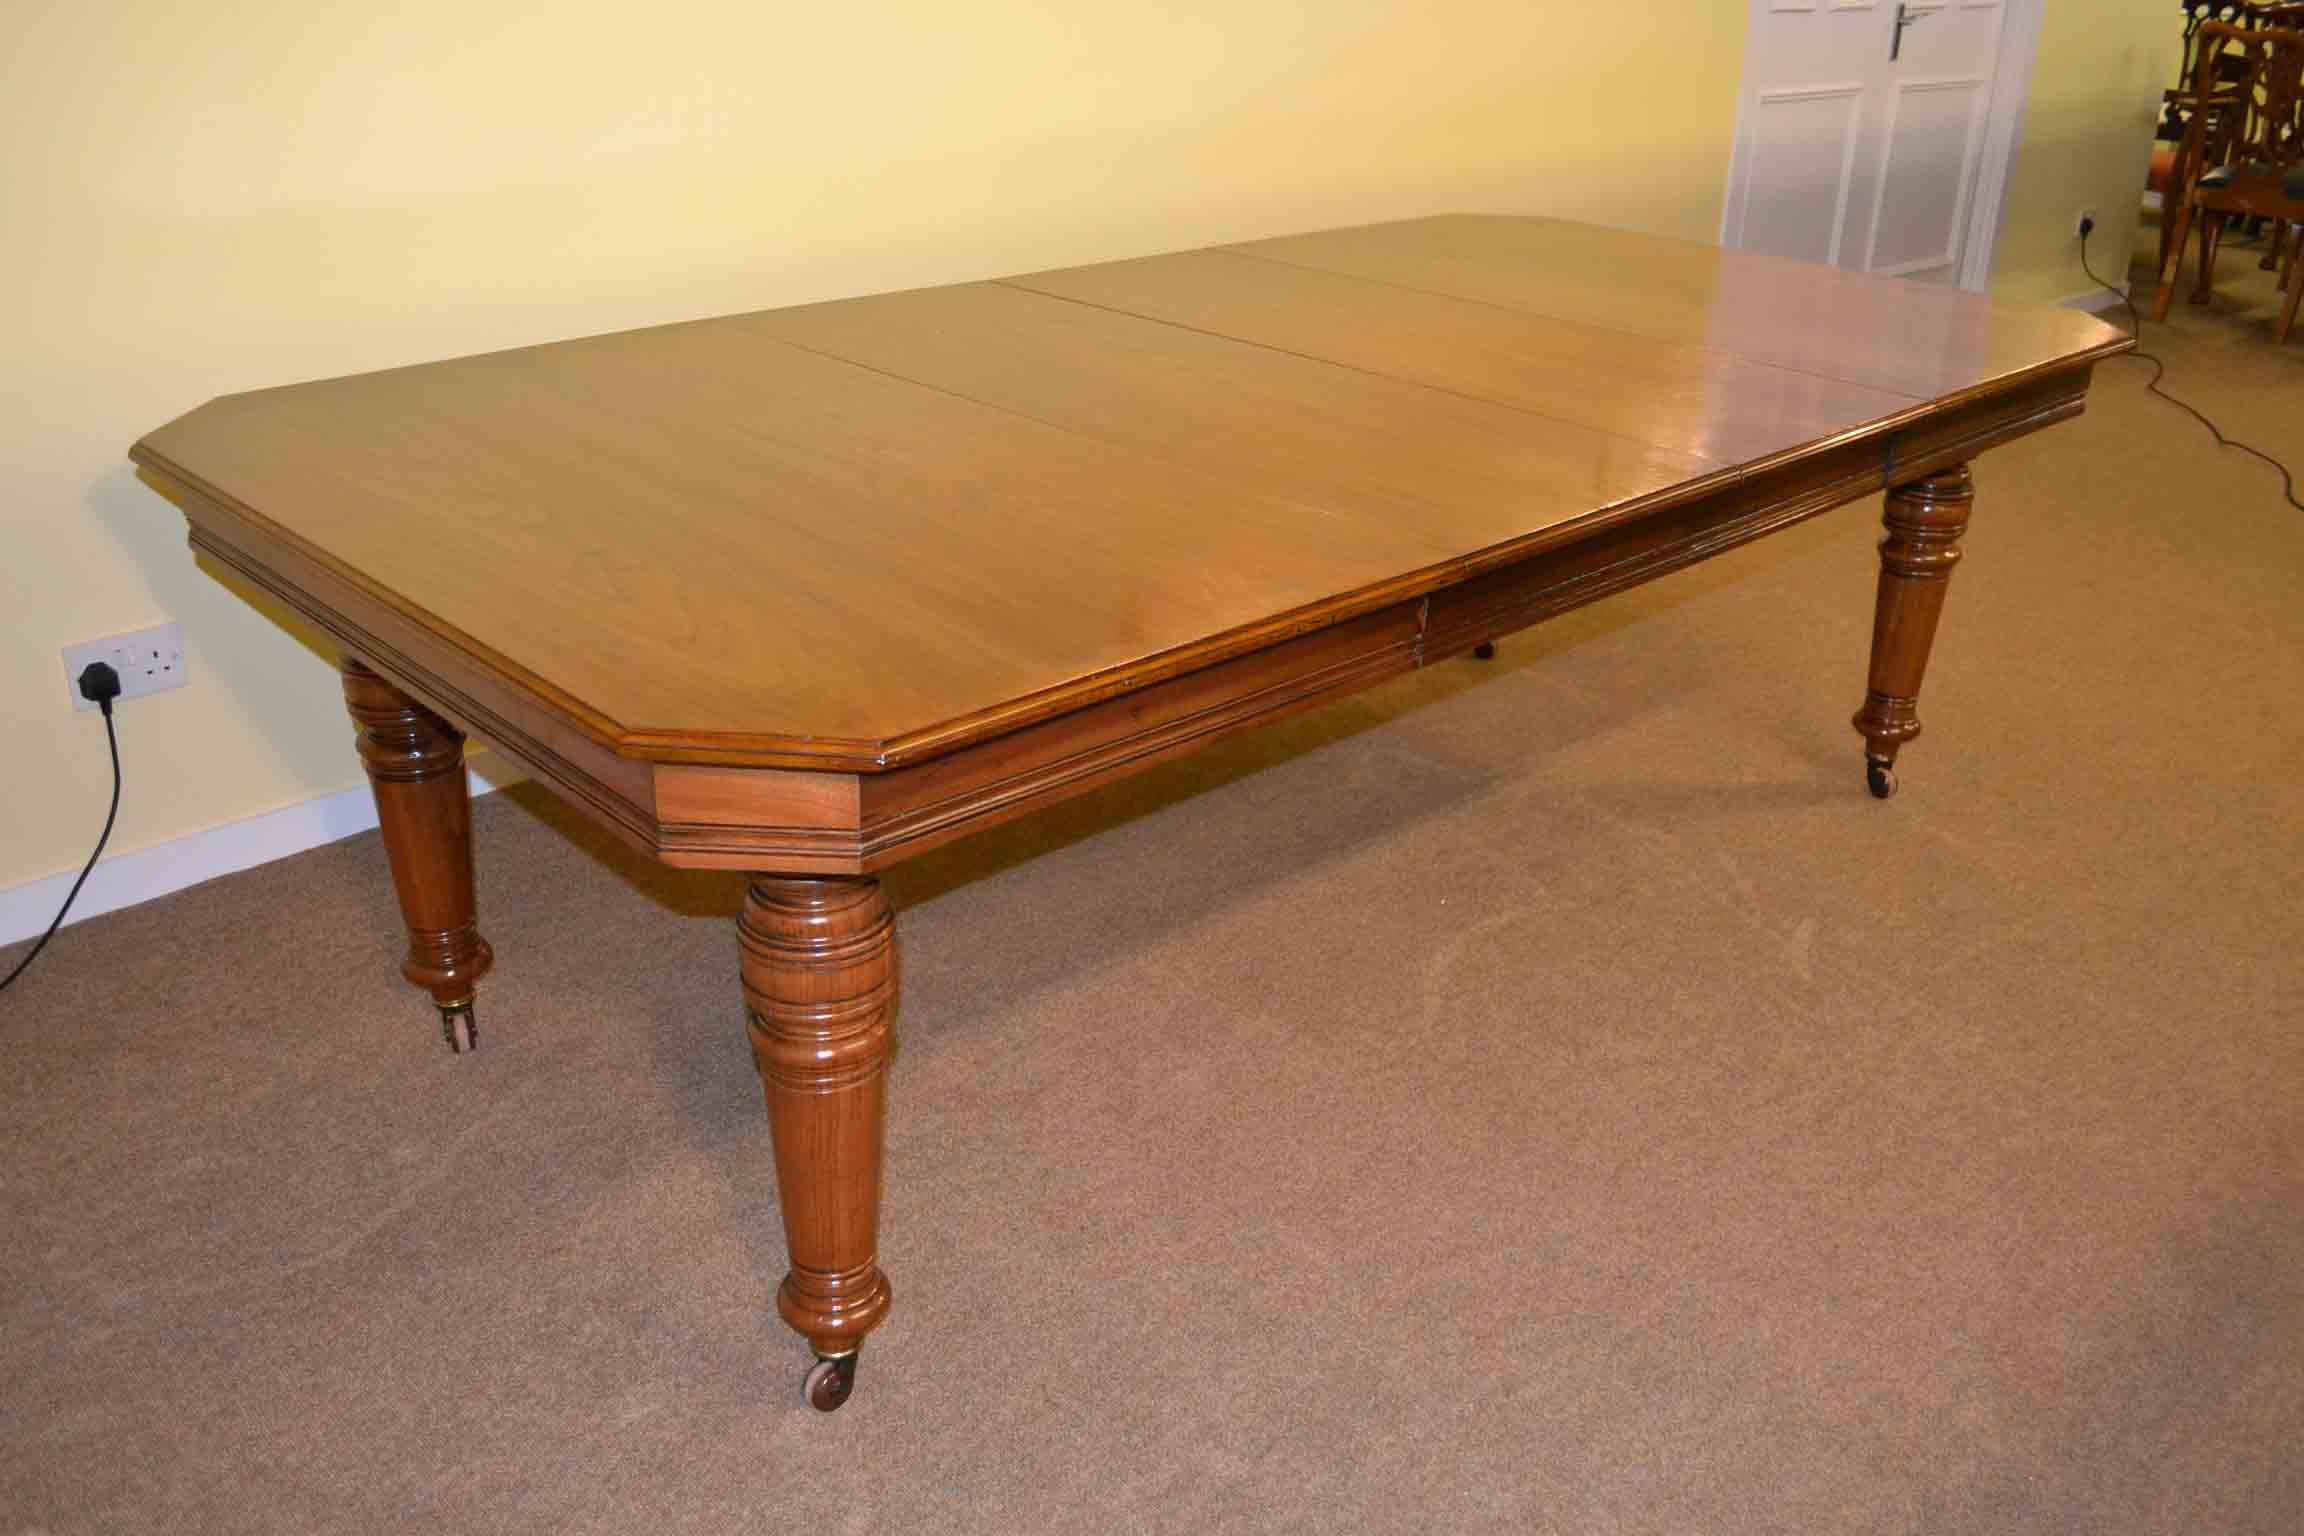 Antique Victorian Dining Table c1880 8 ft Walnut : 03241 Antique Victorian Dining Table c1880 8 ft Walnut 1 from www.regentantiques.com size 2304 x 1536 jpeg 106kB